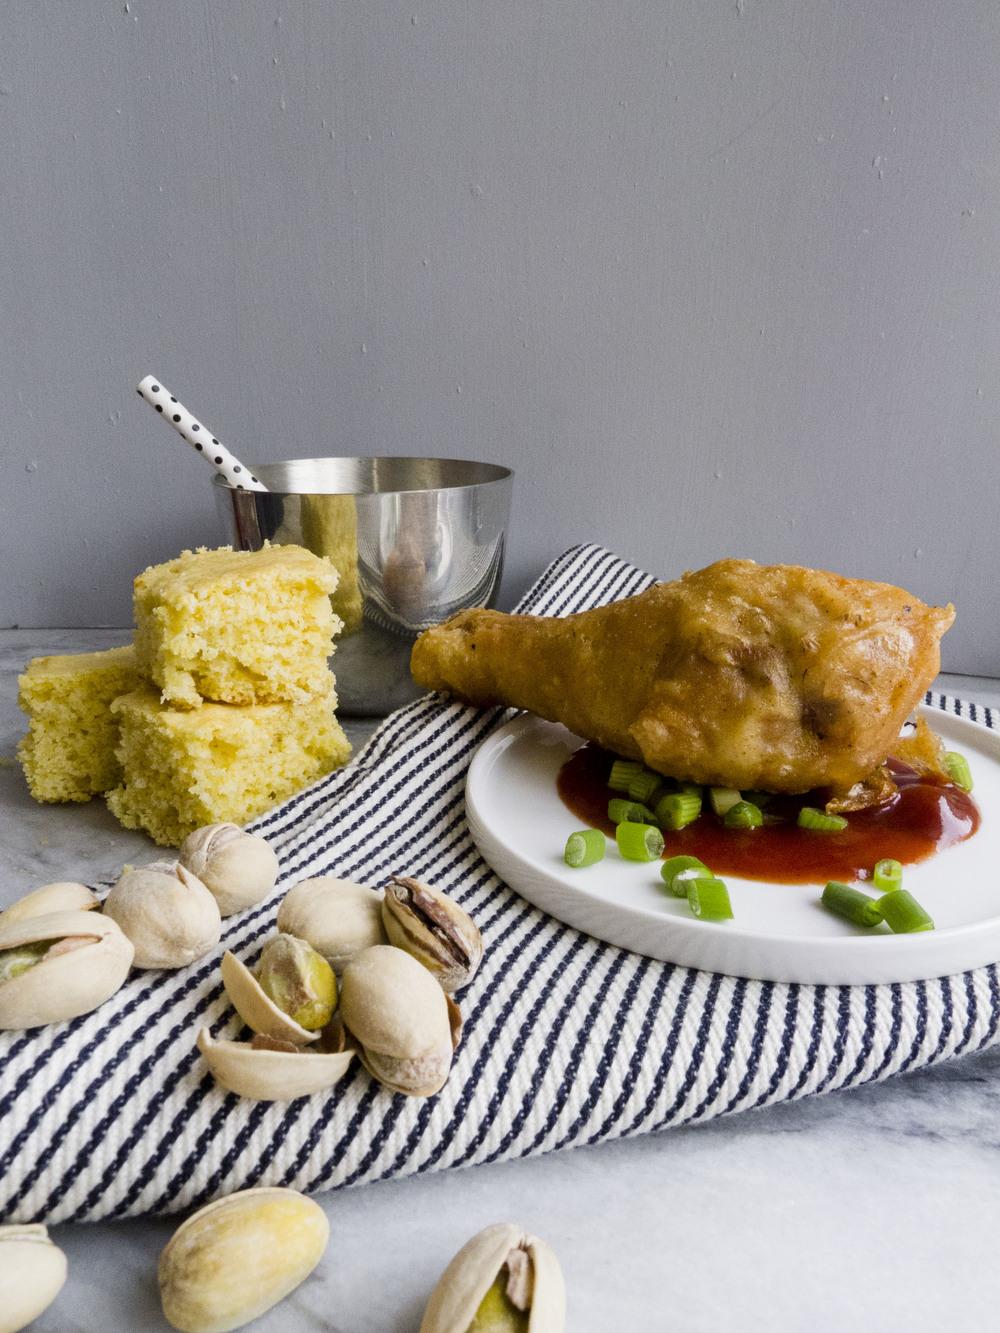 pistachio pairings: bbq chicken, cornbread, celery soda